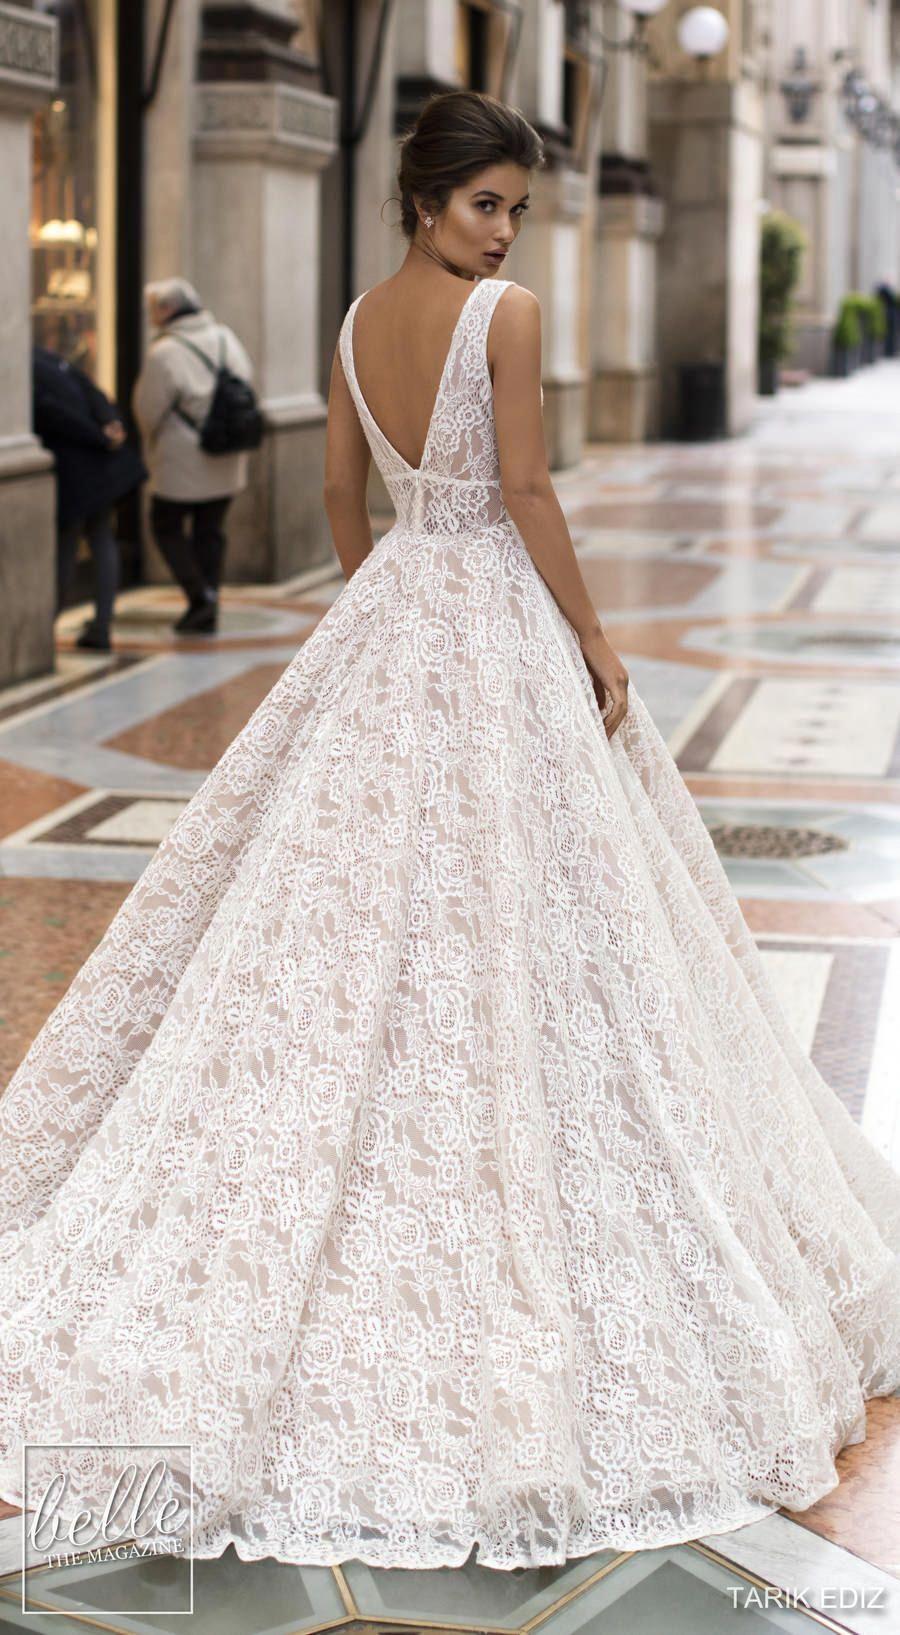 Wedding Dress Shops Wedding Dresses Uk Inexpensive Wedding Dresses Near Me 20190205 Wedding Dresses Wedding Dress Couture Ceremony Dresses